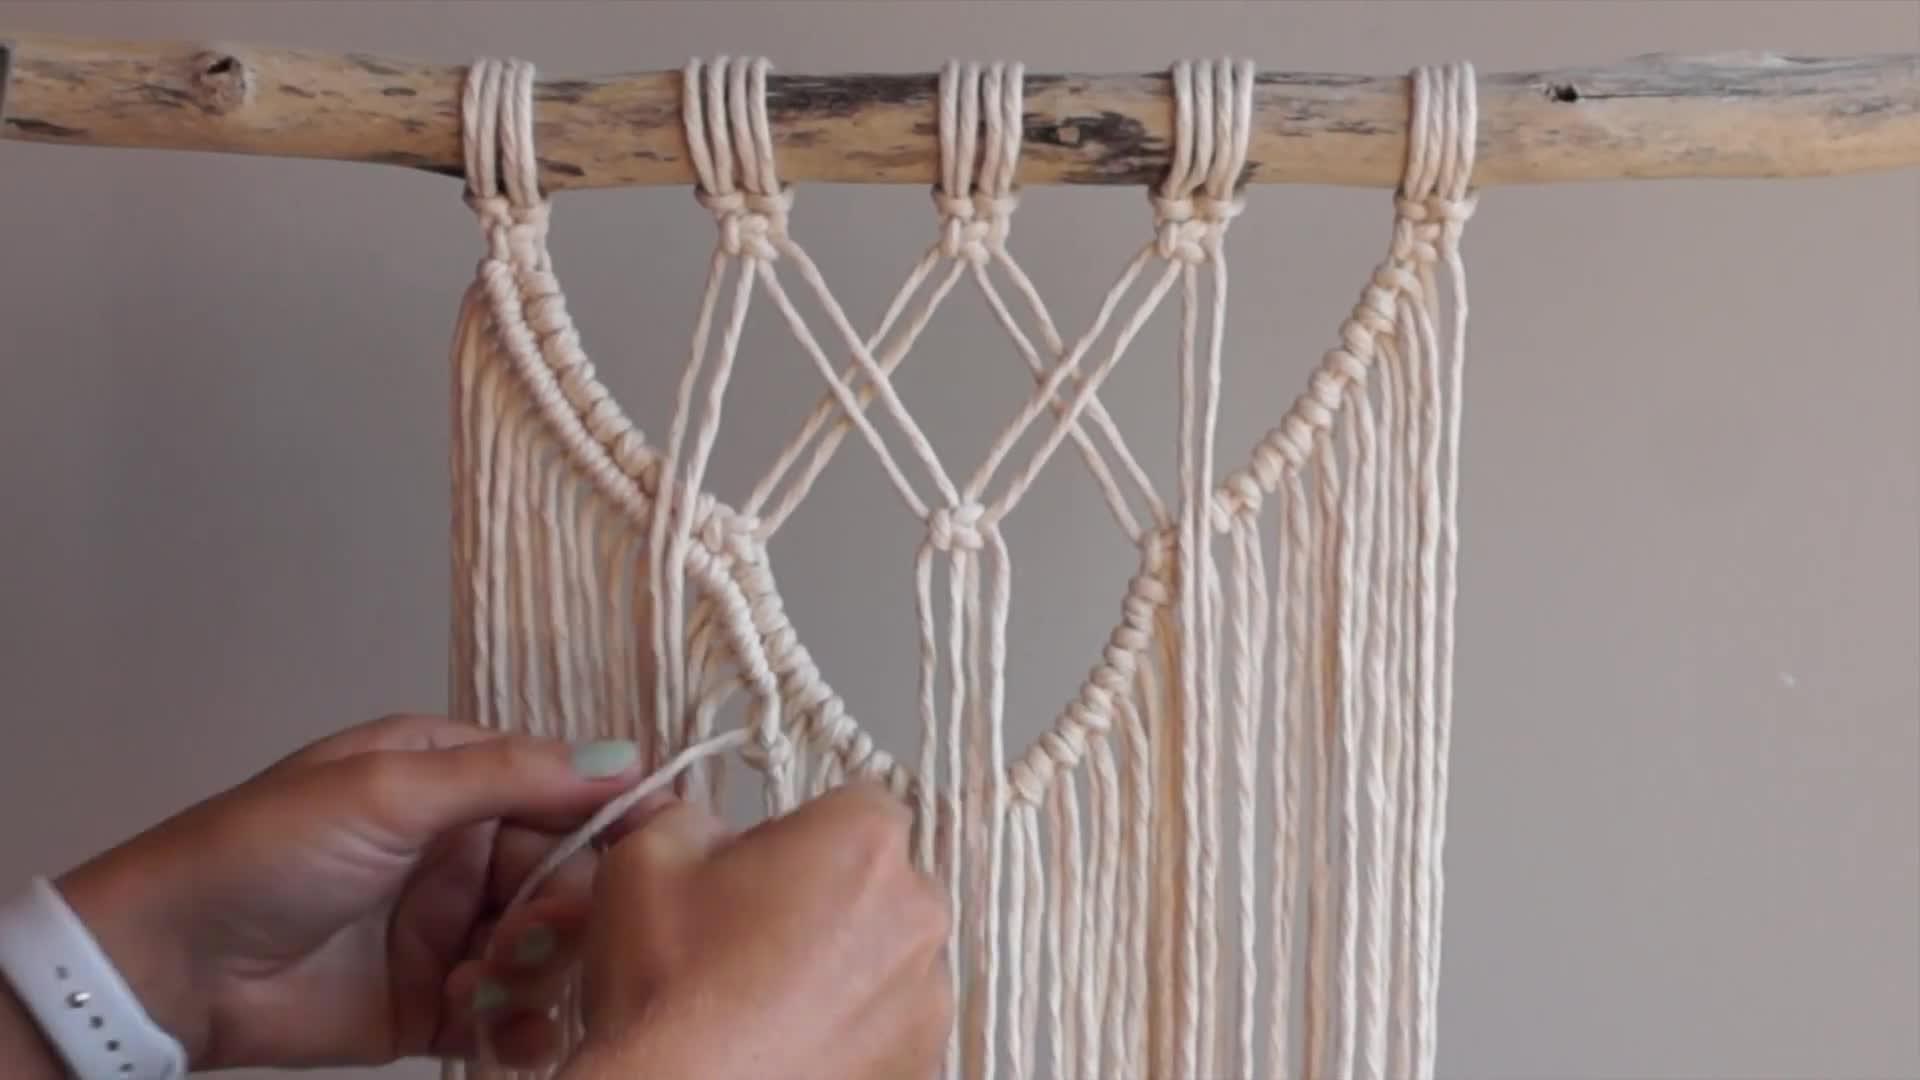 Macrame编织视频教程:中等难度的绳编挂毯编织教程(Part 1)